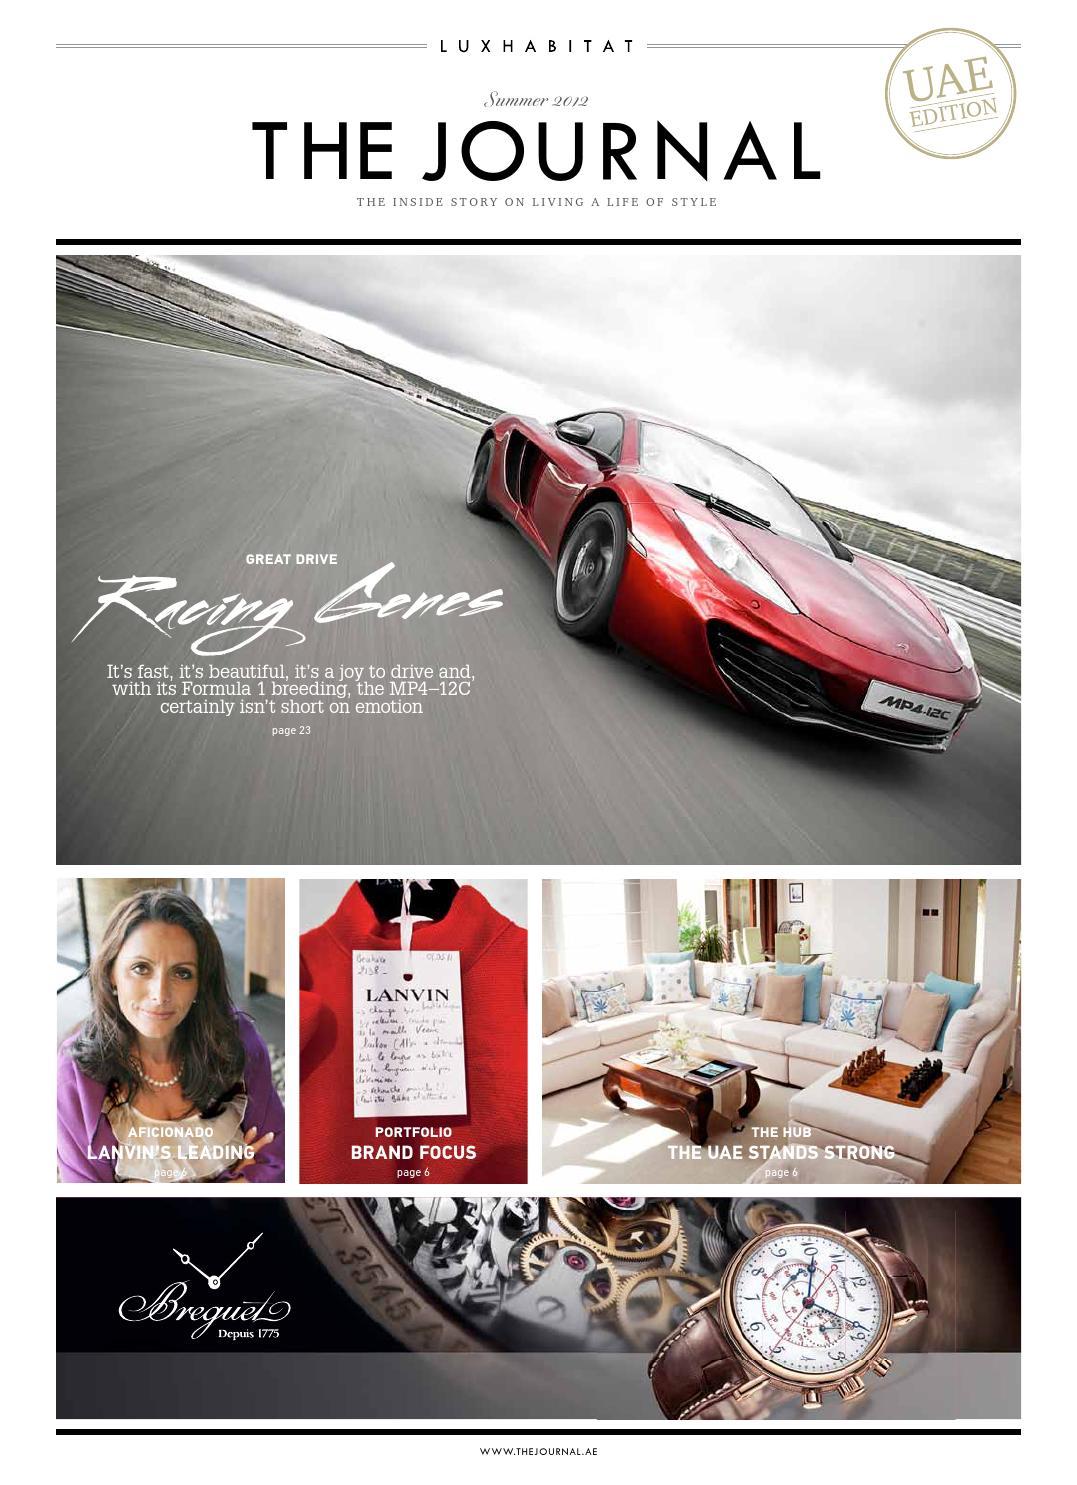 The Journal Summer 2012 National Edition By Luxhabitat Issuu Suqma Serenity Greyish Blue M